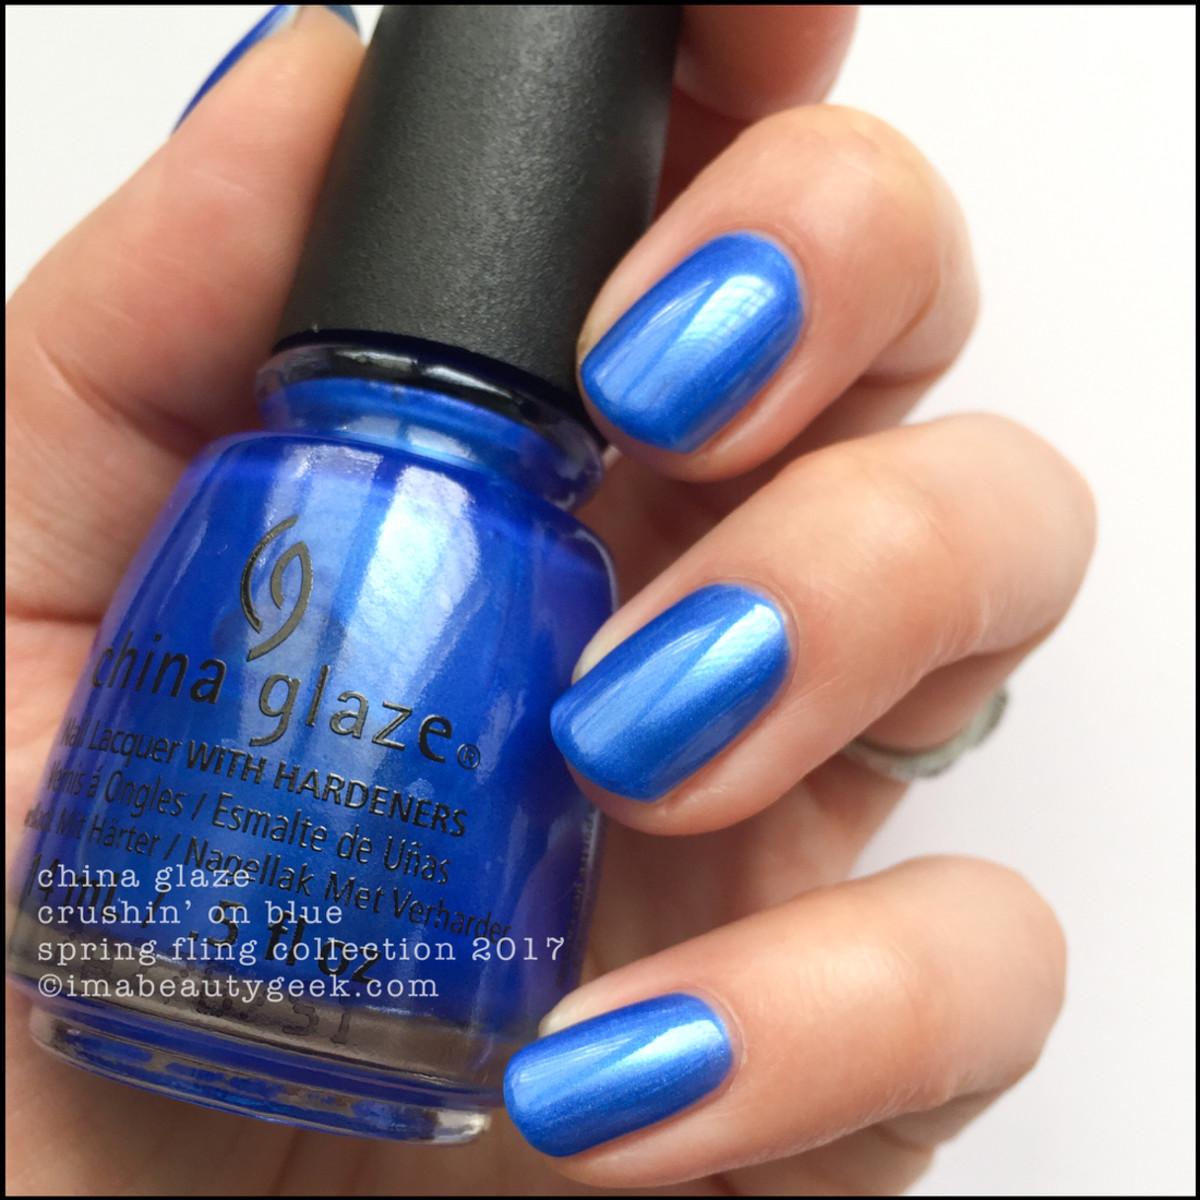 China Glaze Crushin on Blue_China Glaze Spring Fling Collection Swatches